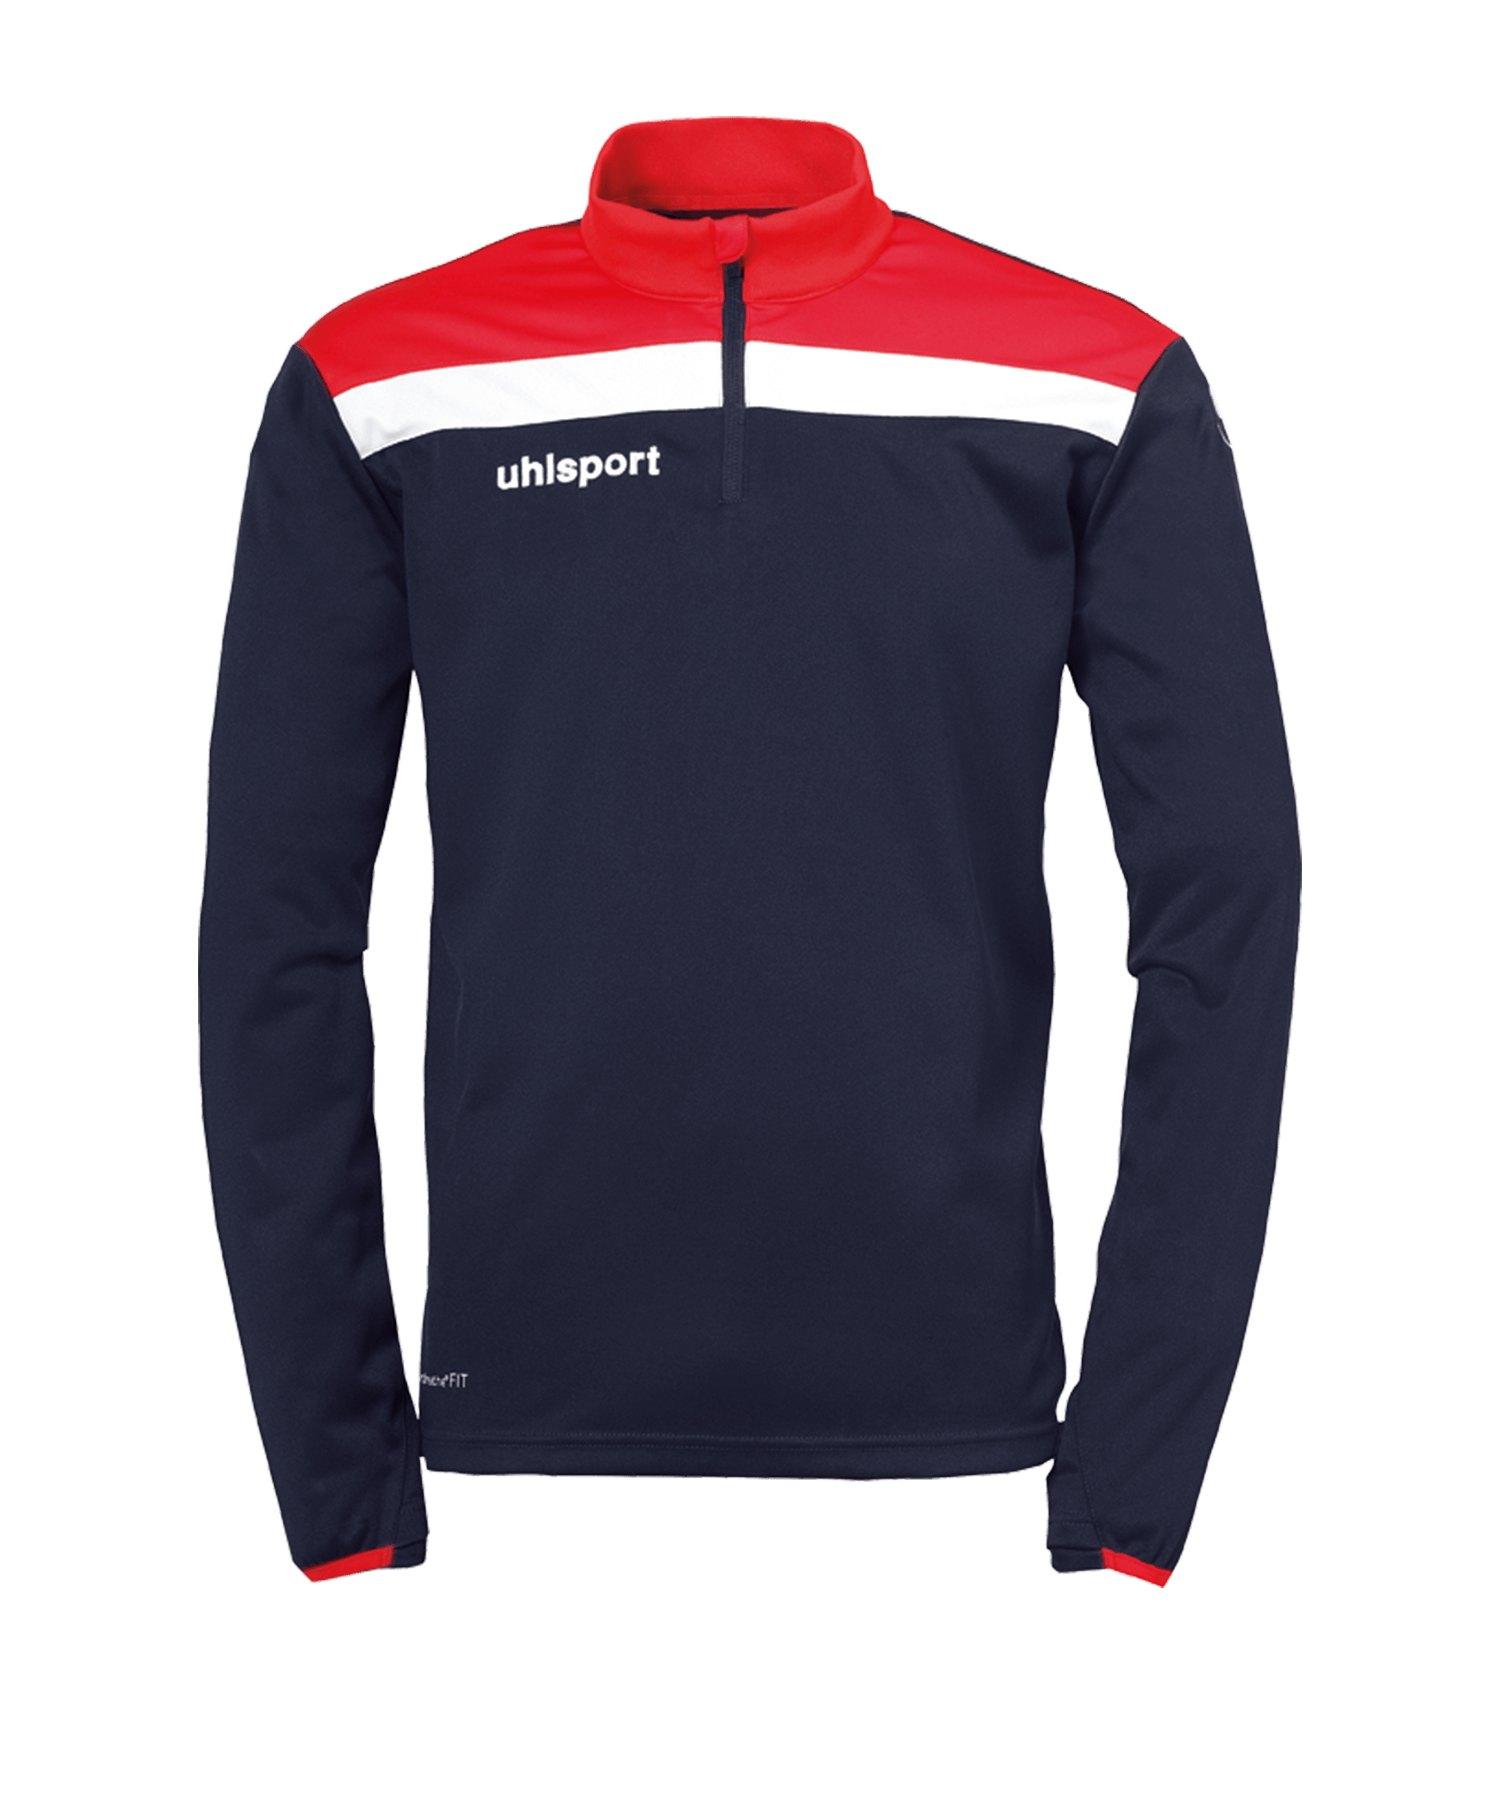 Uhlsport Offense 23 Ziptop Blau Rot F10 - blau